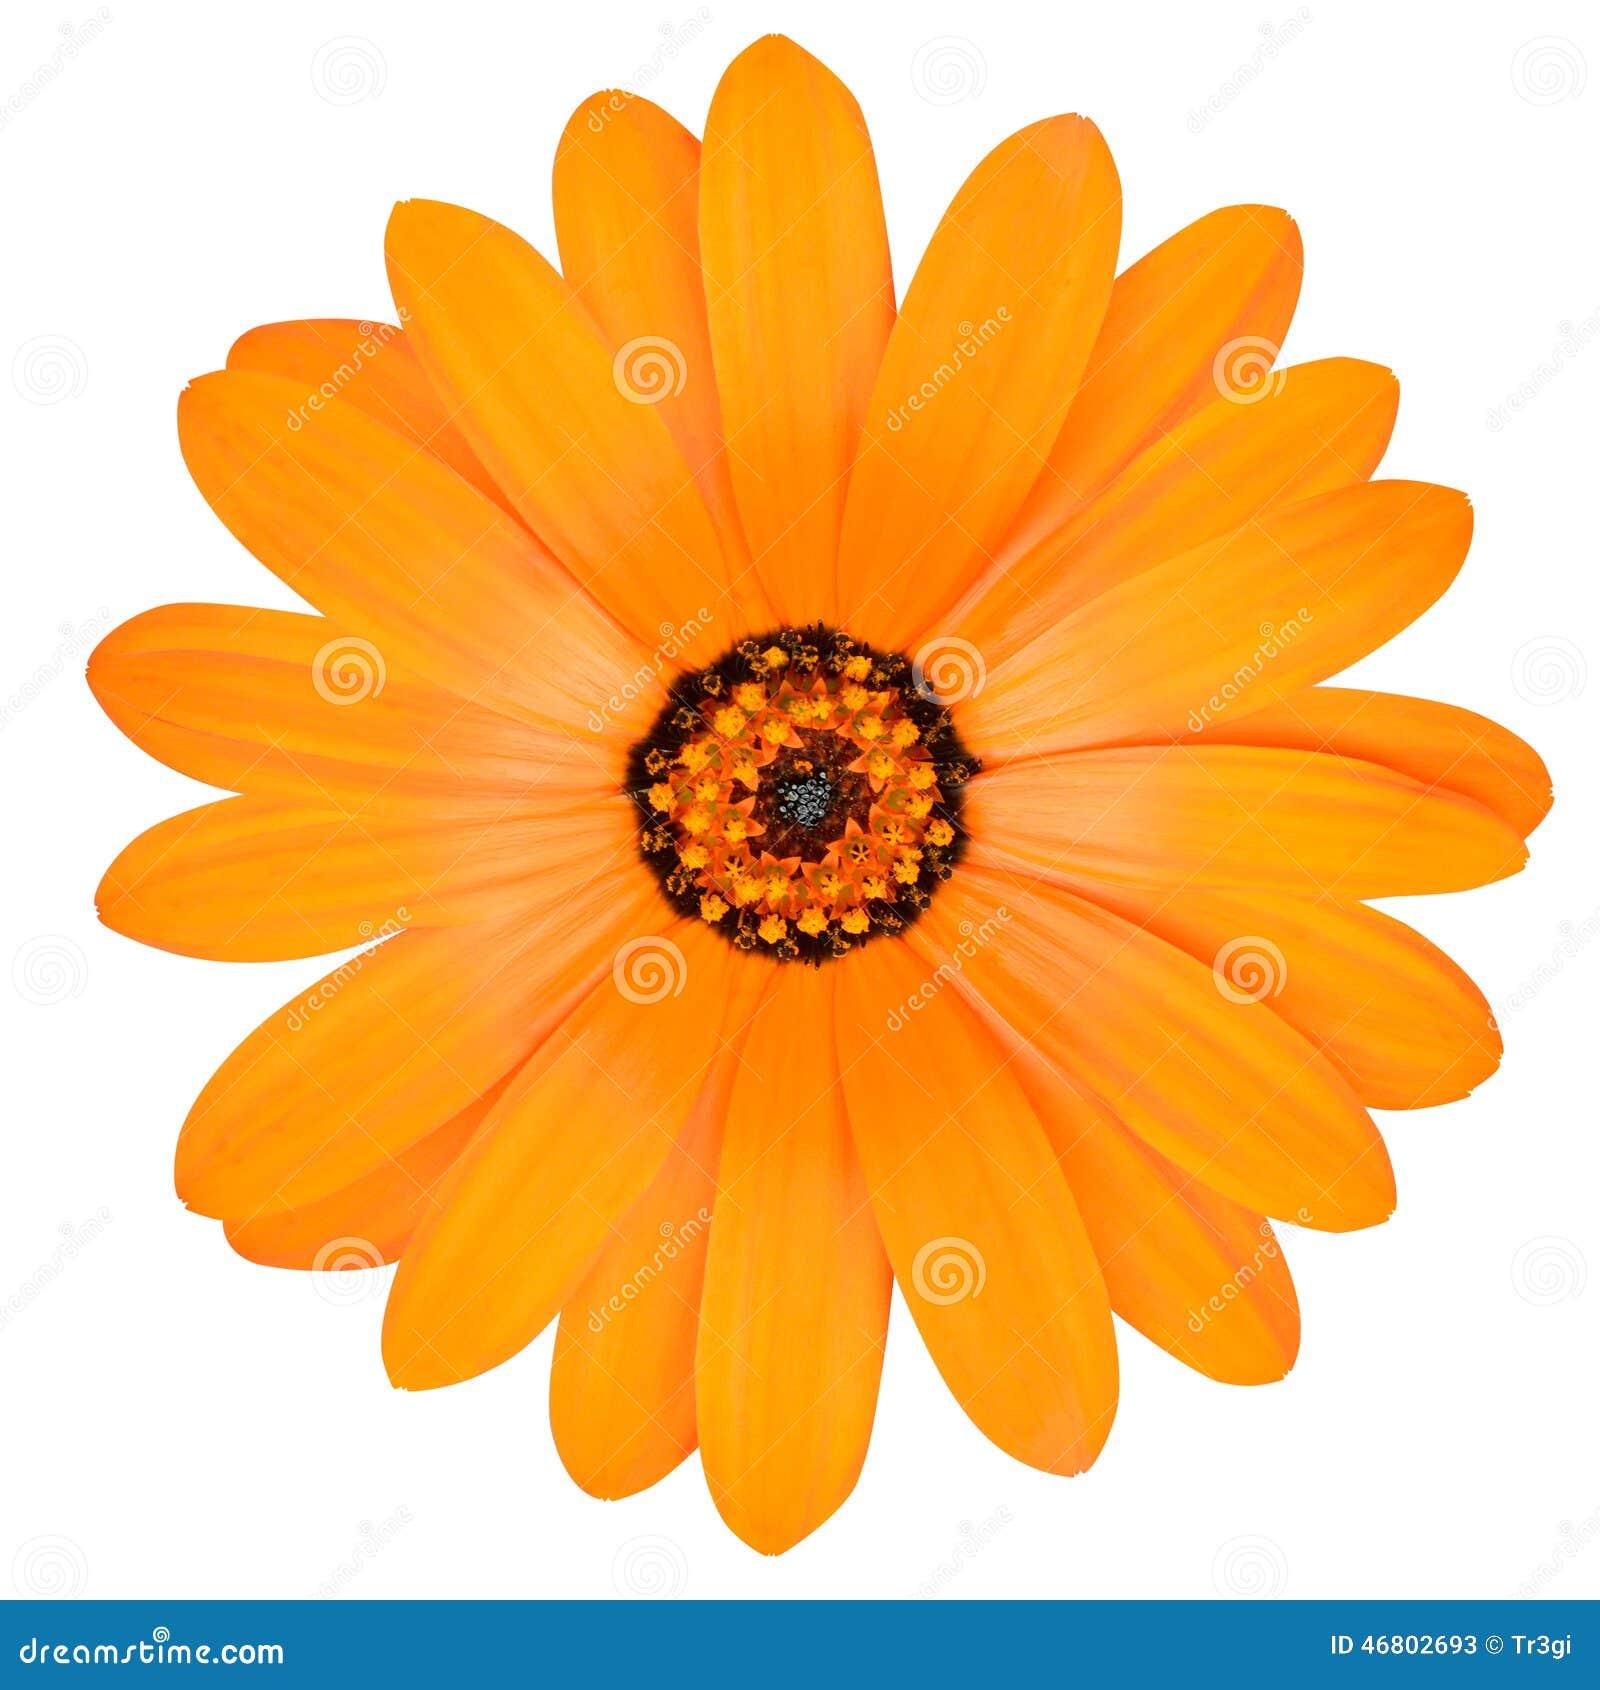 orange ringelblume blume in voller bl te lokalisiert stockbild bild von vollkommen vibrant. Black Bedroom Furniture Sets. Home Design Ideas